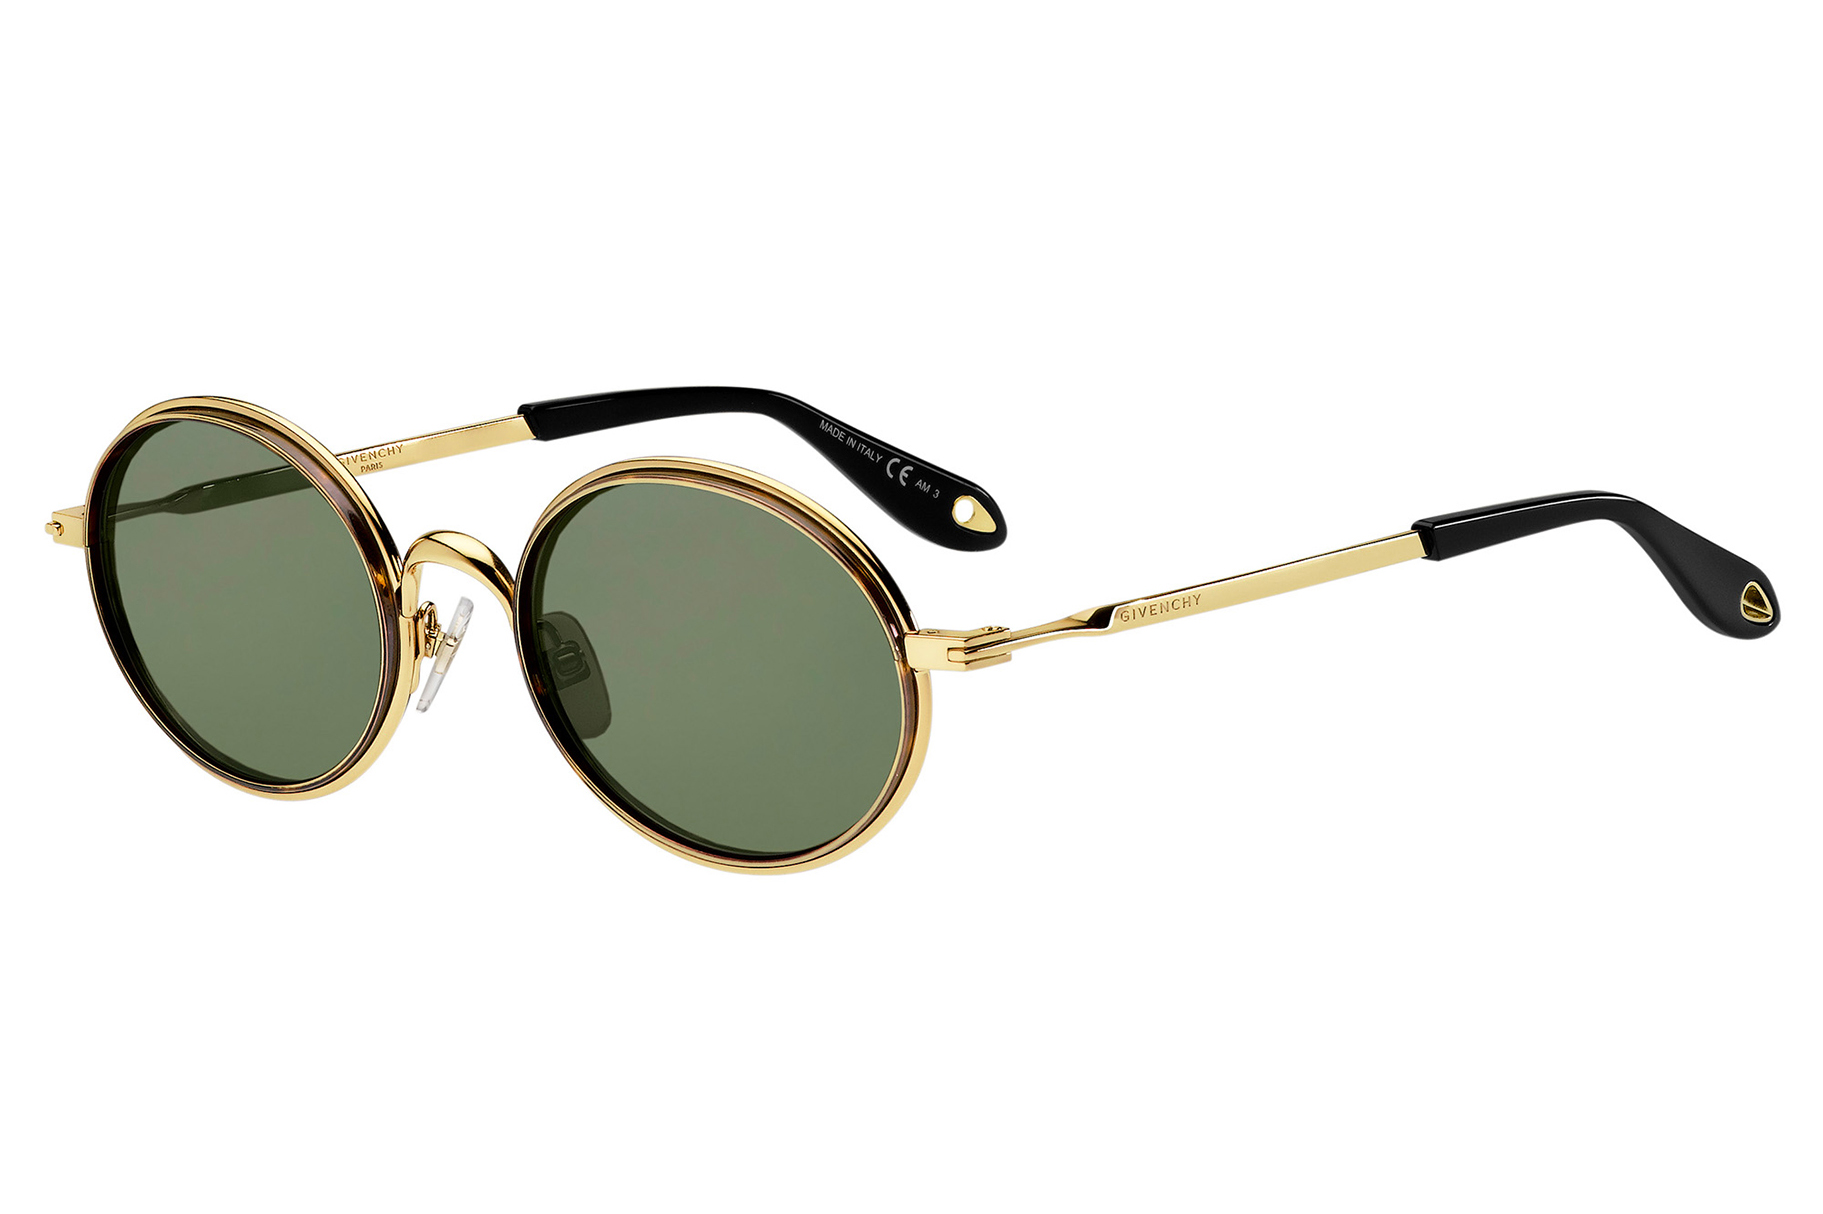 61e1be1e464 ... Givenchy Sunglasses - product design ...